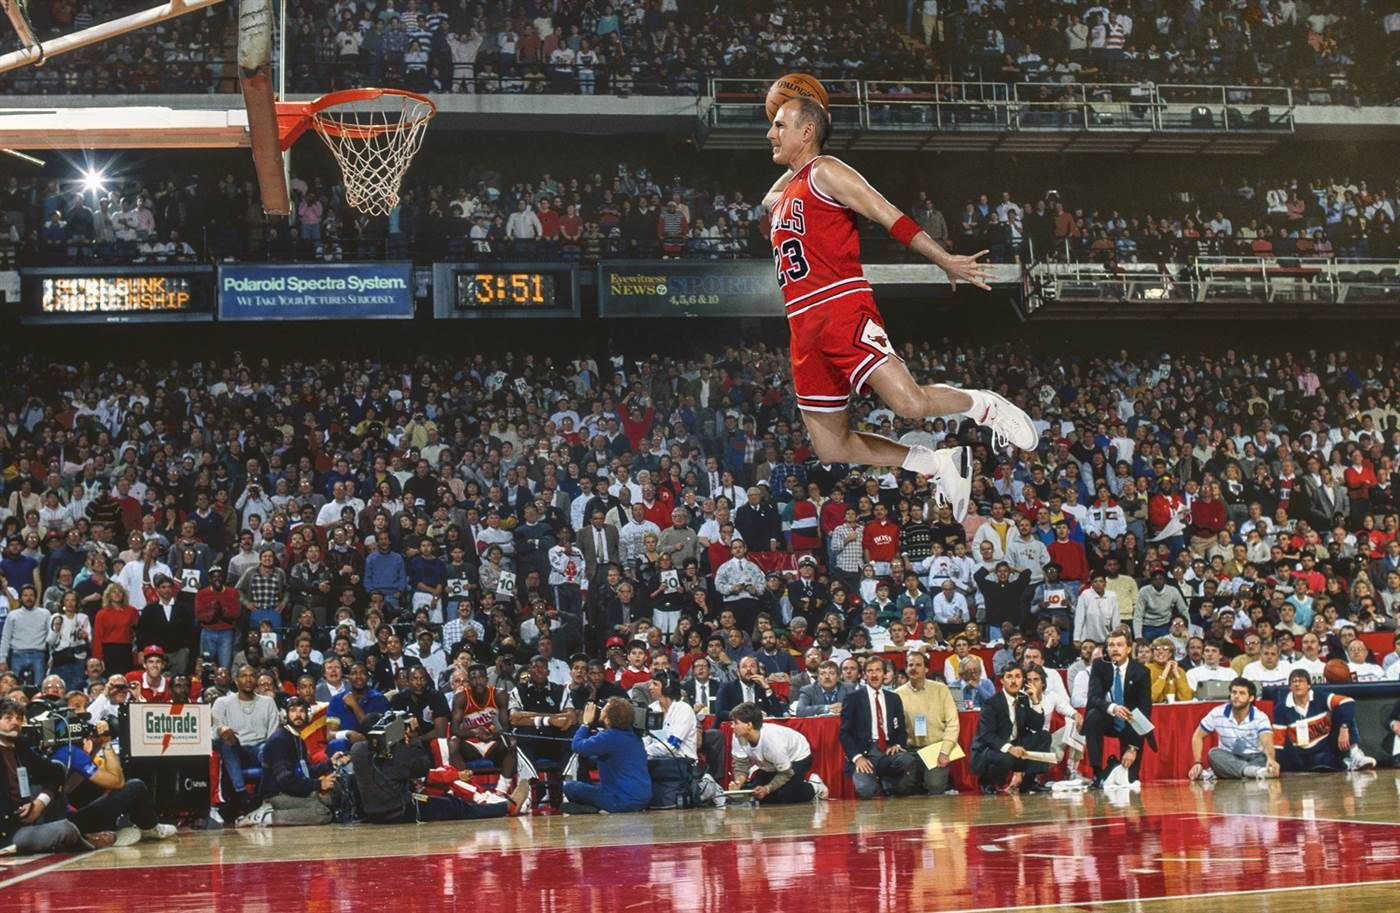 caricia Mecánicamente Interpretativo  Air Lauer: Matt recreates Michael Jordan's dunking pic | Michael jordan  basketball, Michael jordan pictures, Nba slam dunk contest